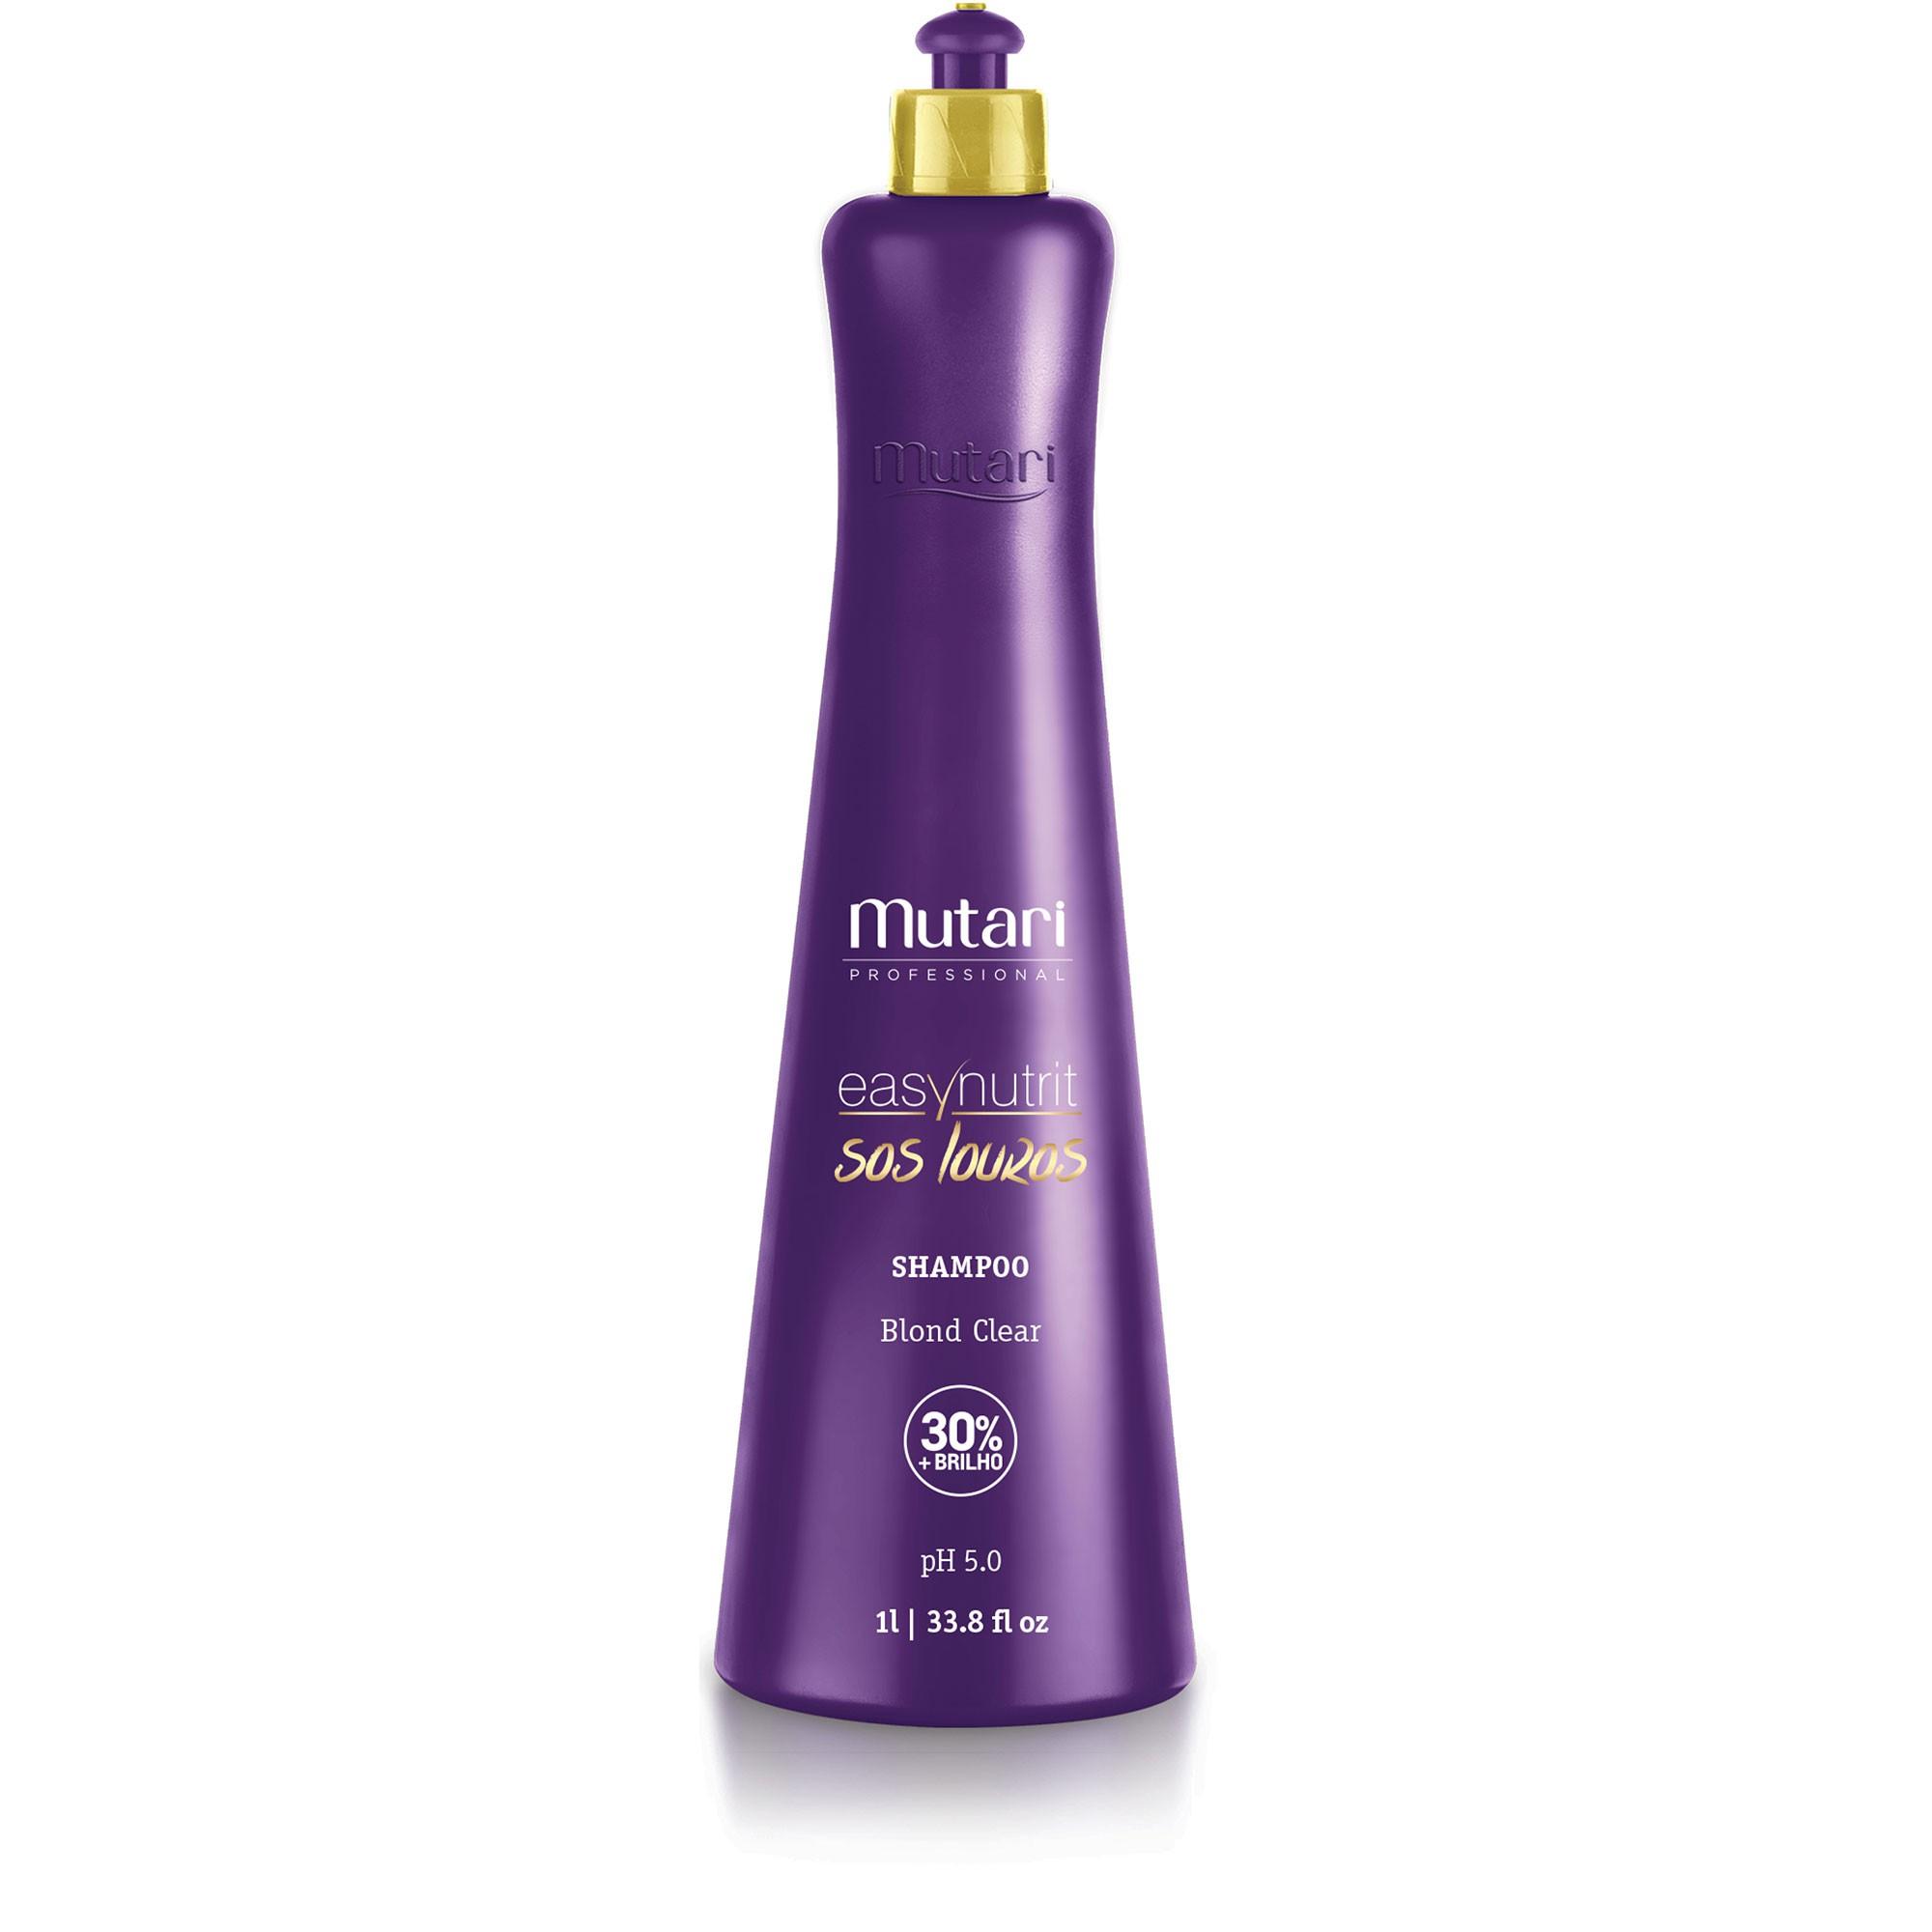 Shampoo Blond Clear - SOS Louros PROF 1L